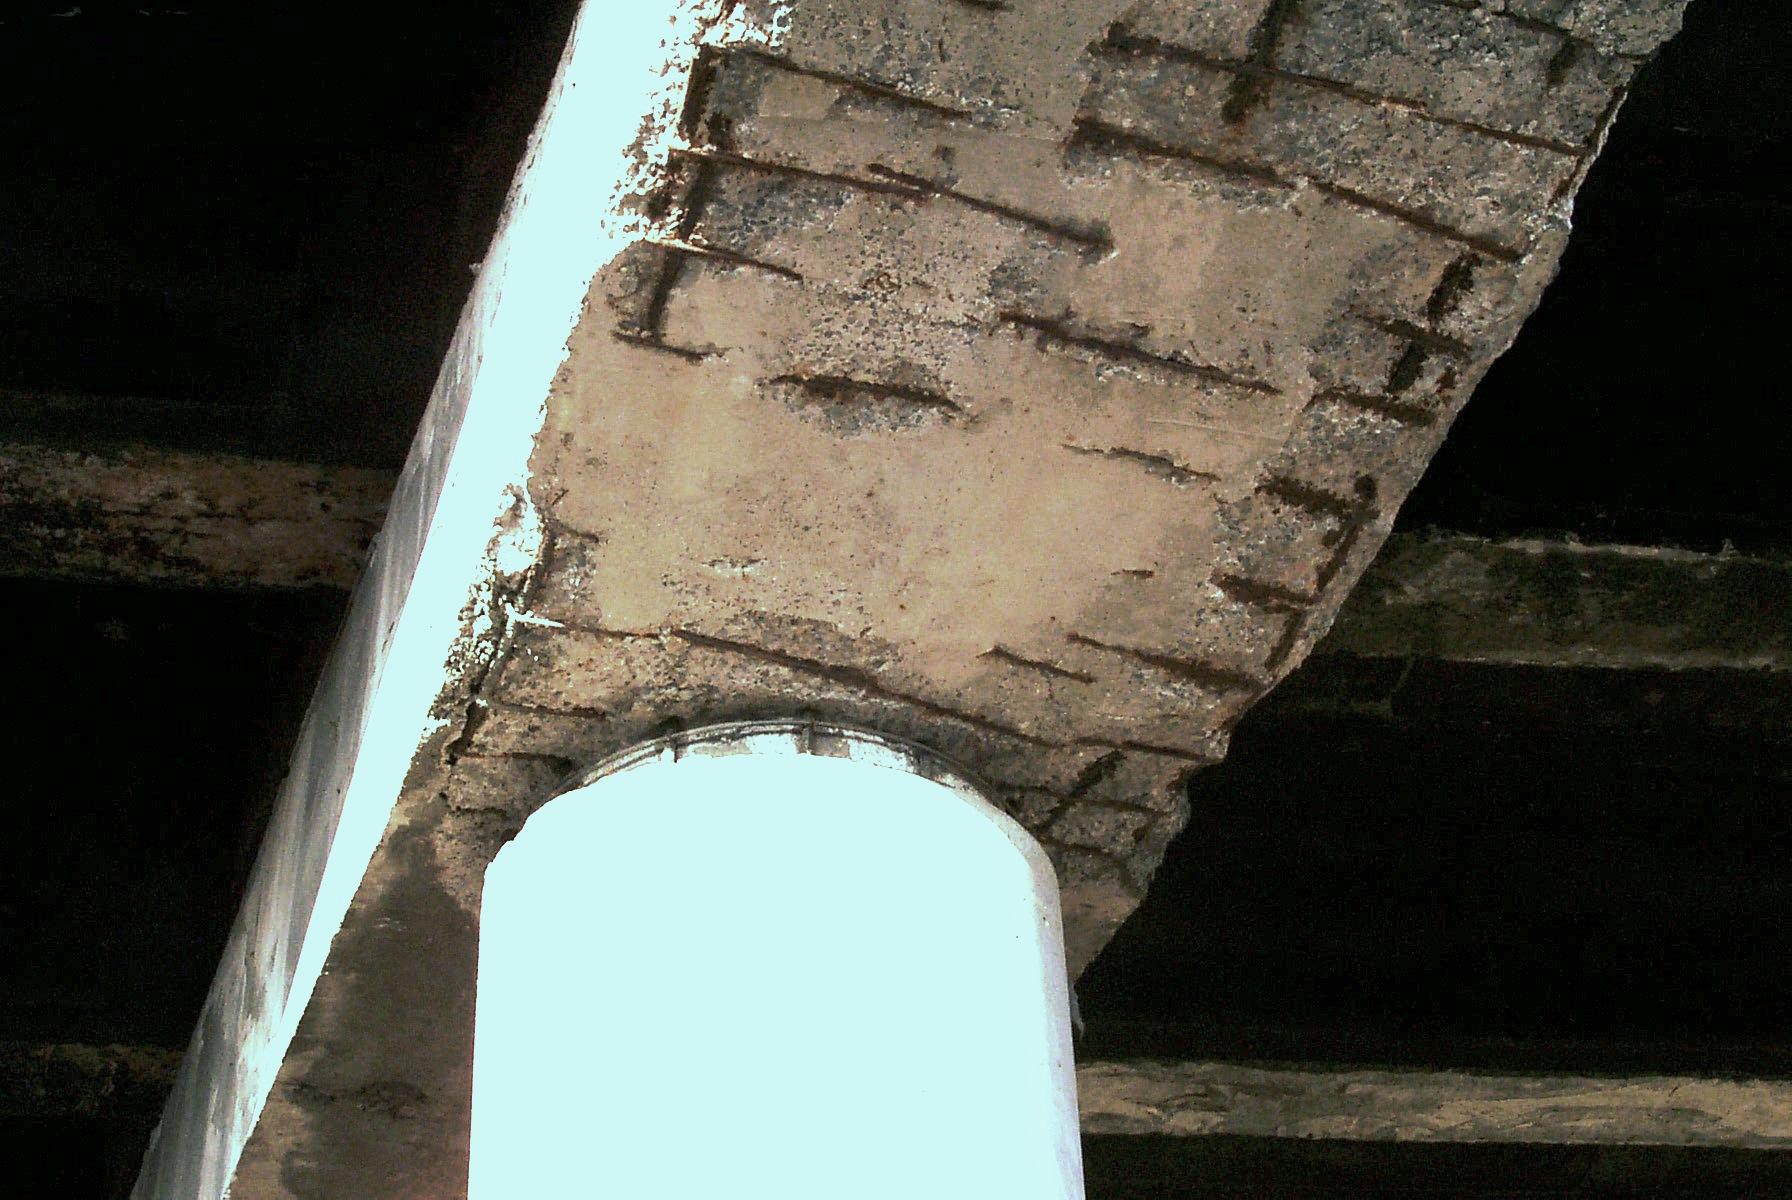 Reparatii pasaje km 11 si 13 pe A1 MAPEI - Poza 2